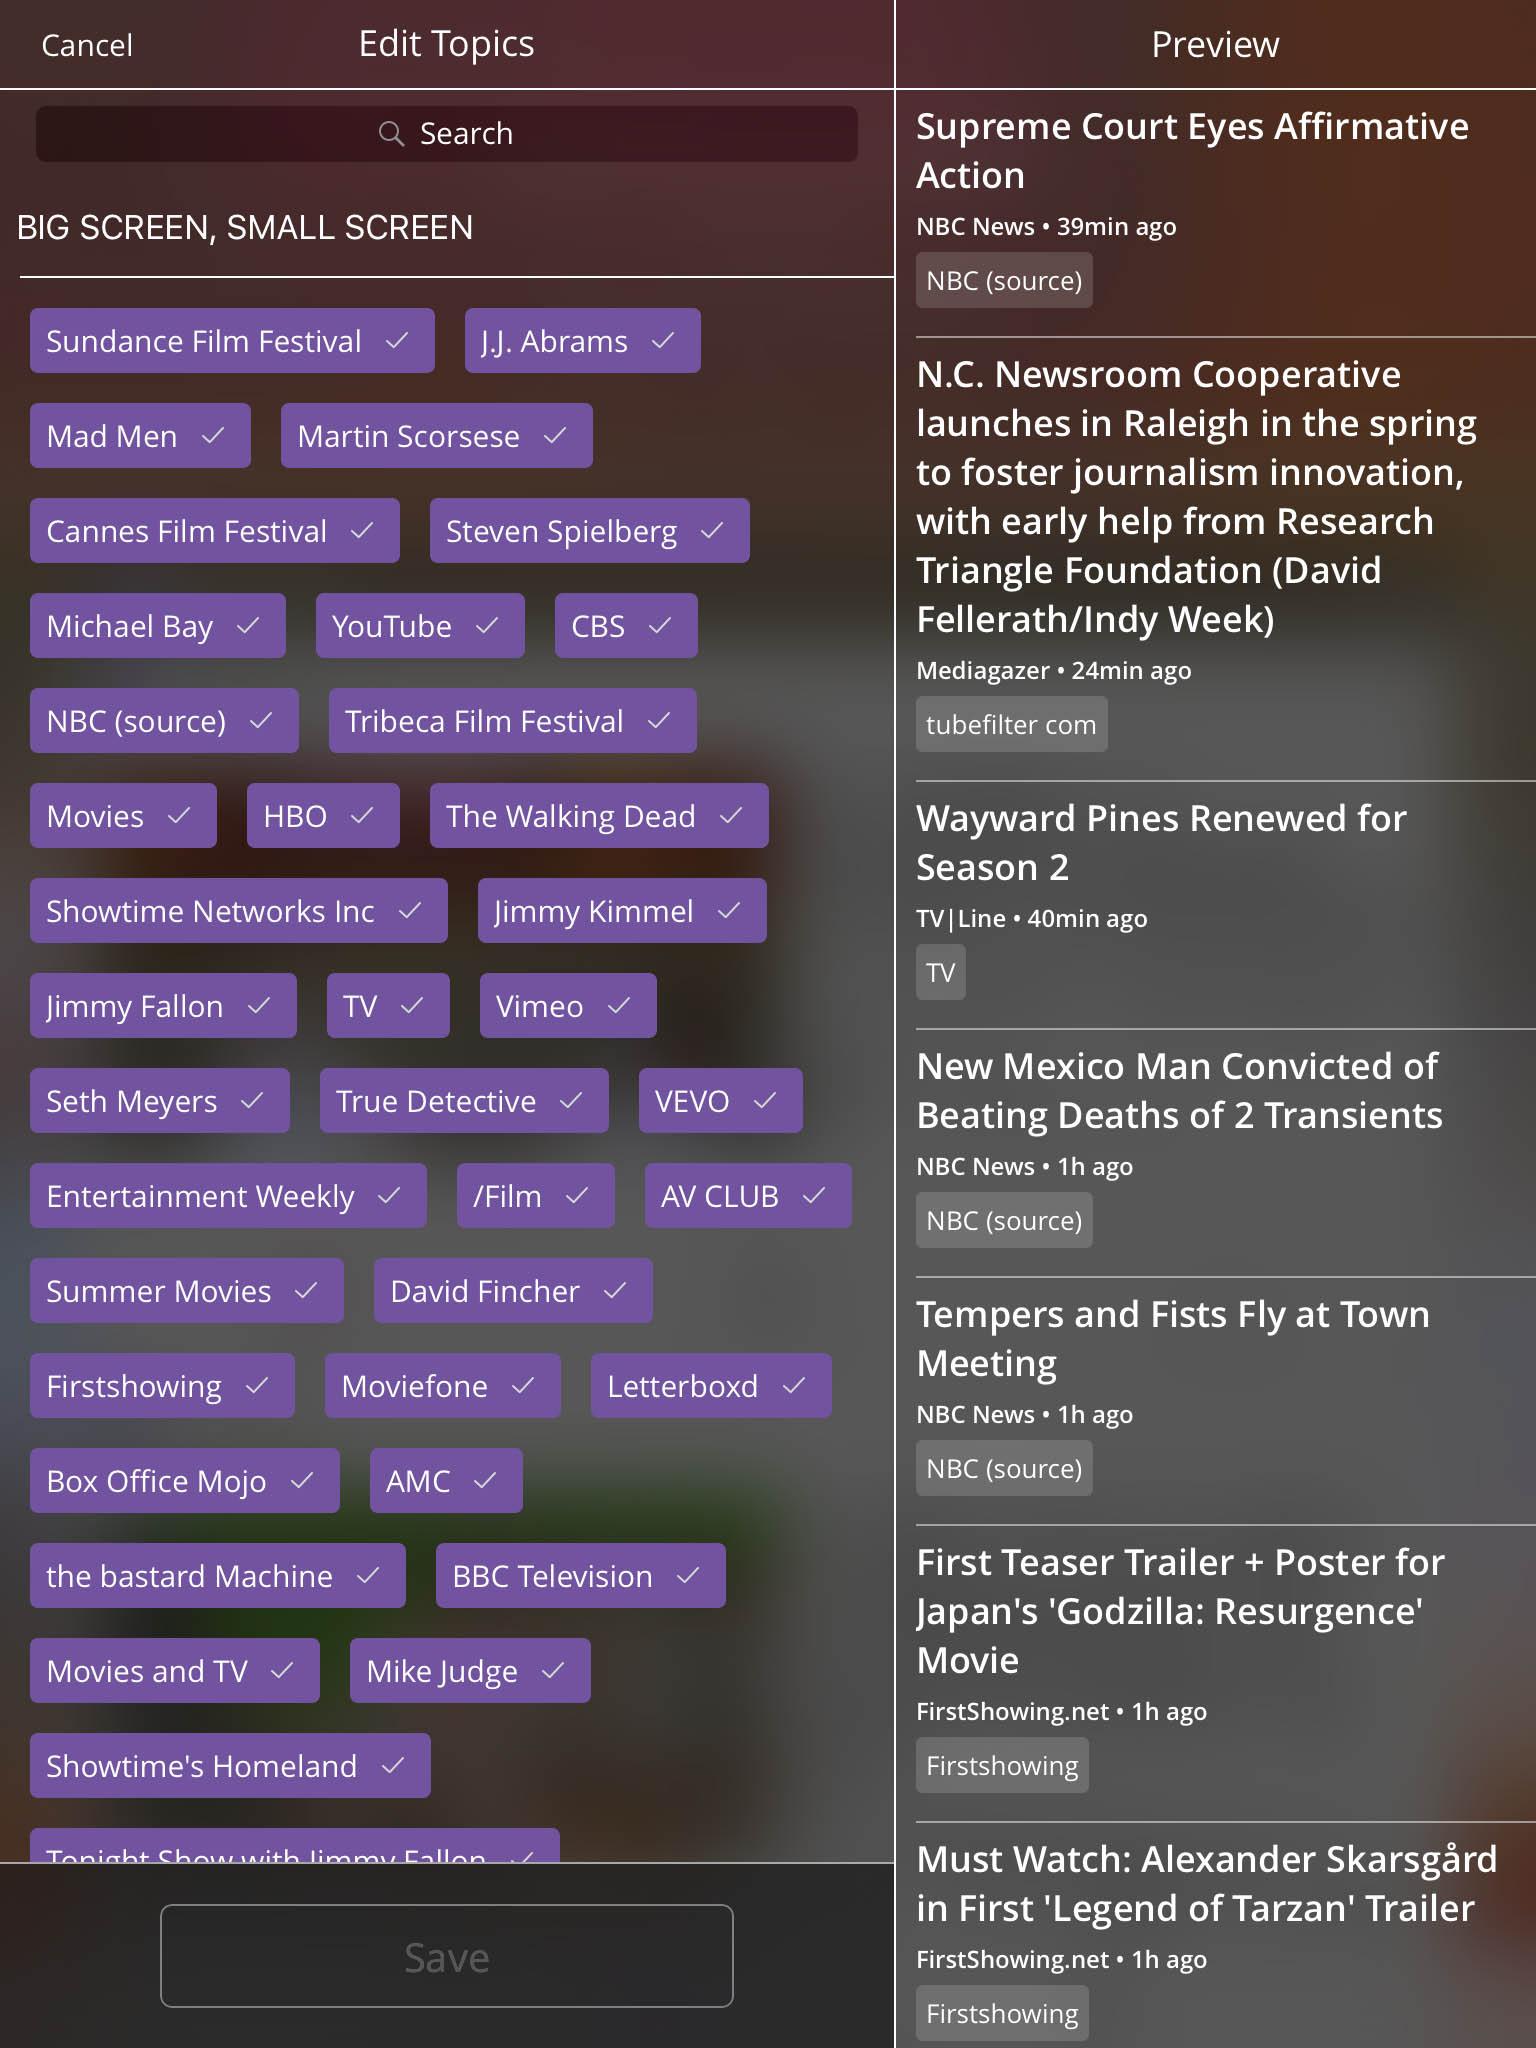 iOS: Topic Editing, Real Time Feedback